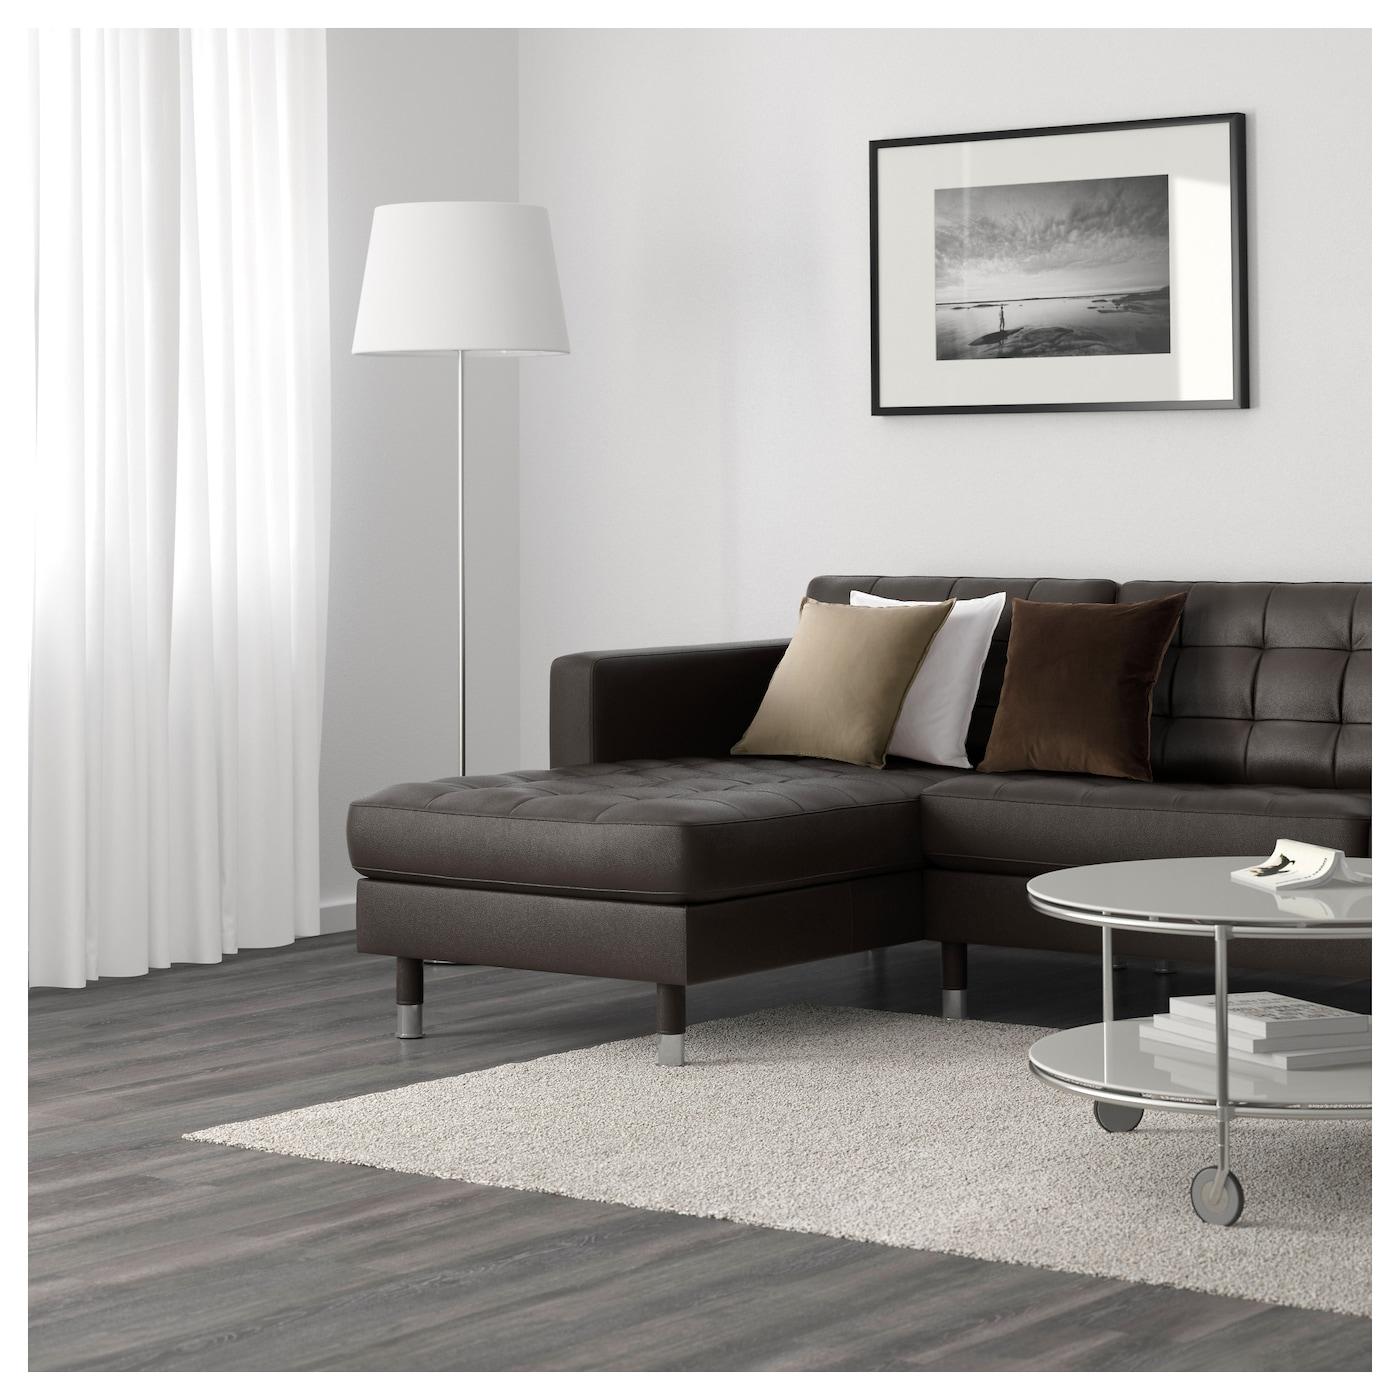 Landskrona 5 seat sofa with chaise longues grann bomstad for Chaise longue en aluminium